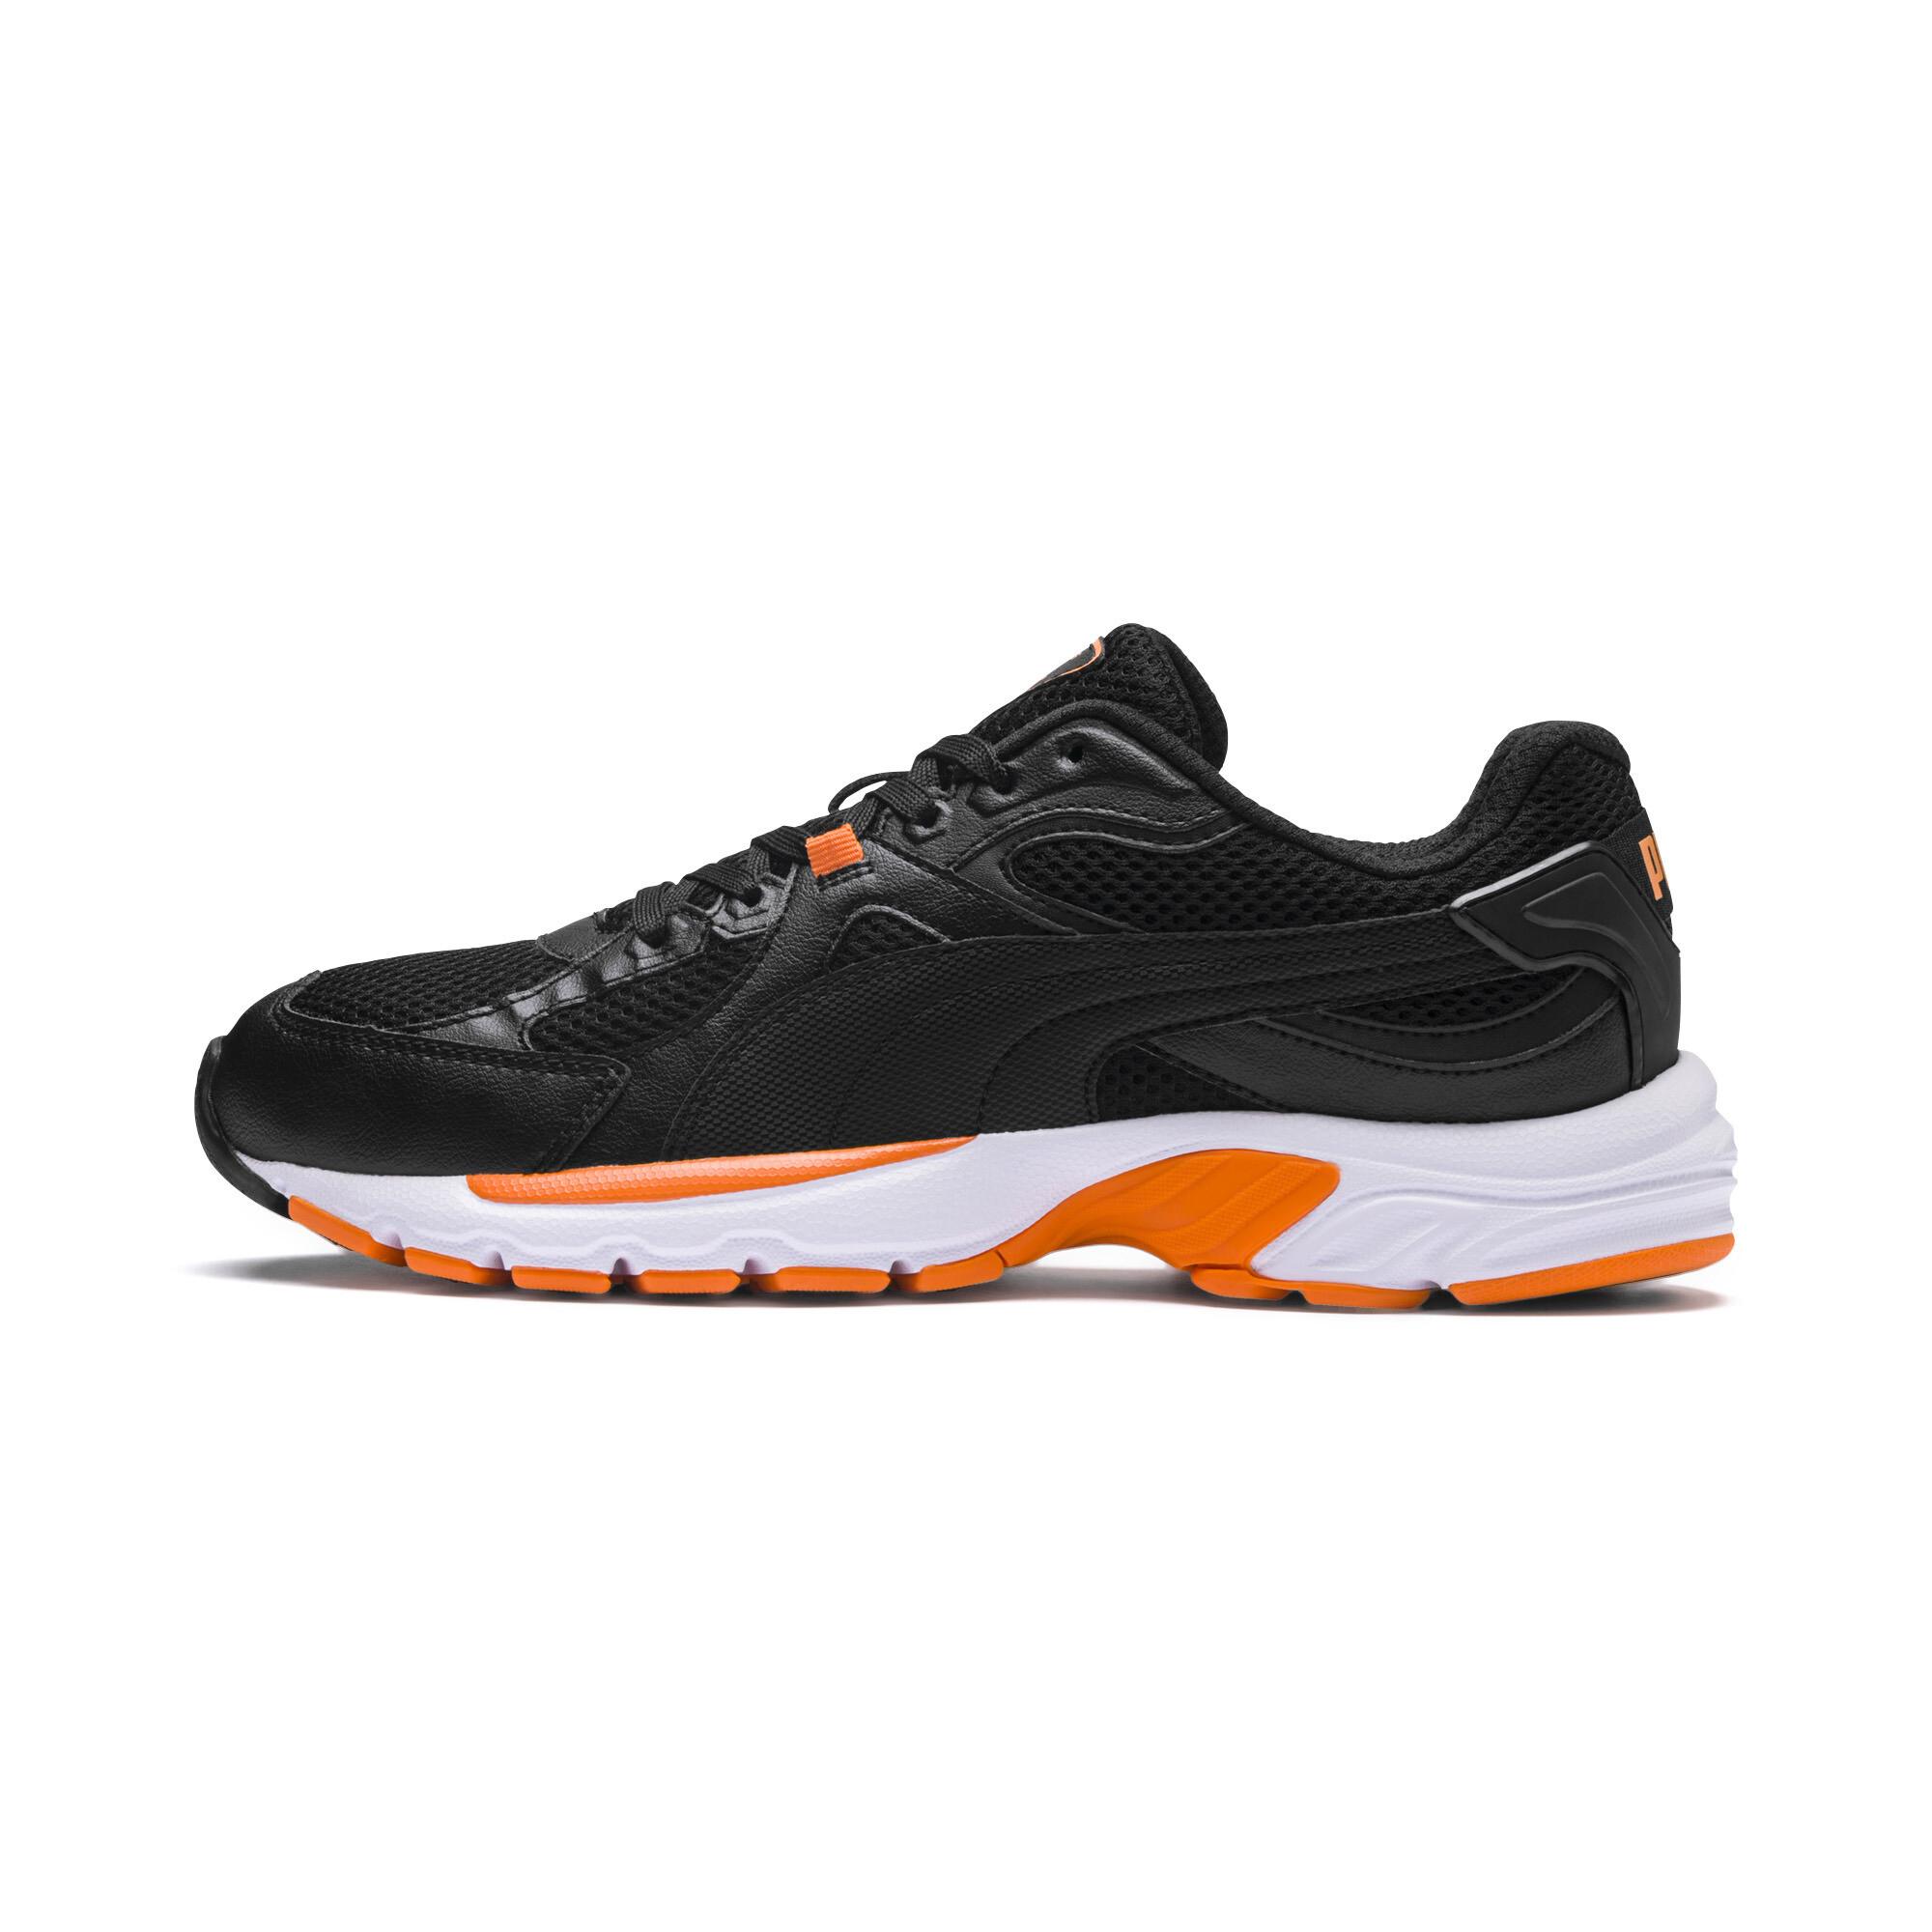 PUMA-Axis-Plus-90s-Sneakers-Men-Shoe-Basics thumbnail 4